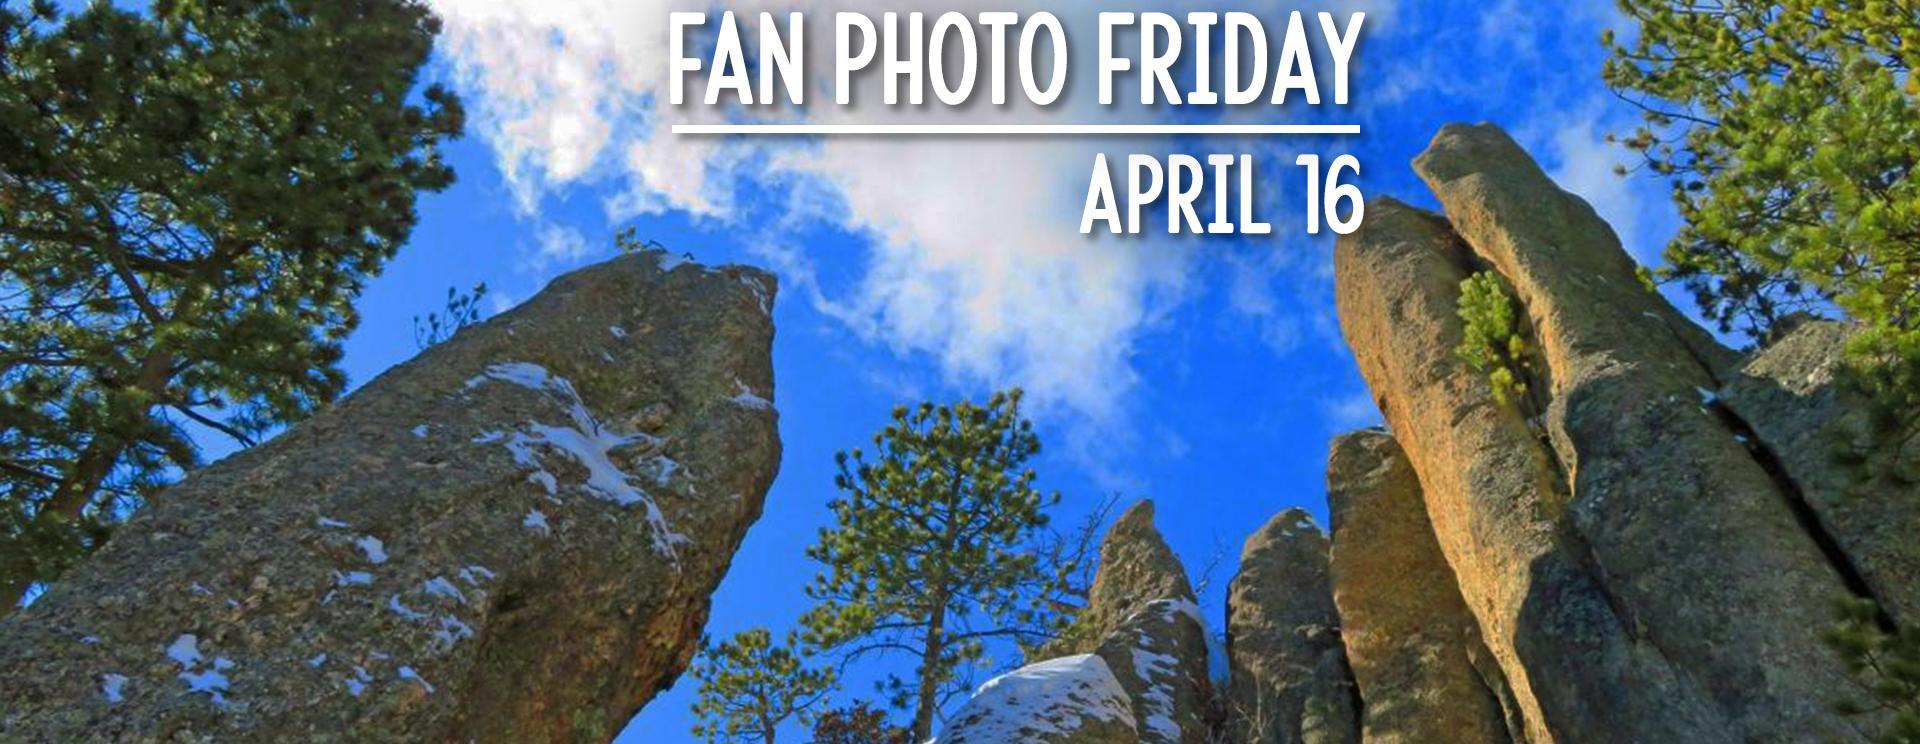 Fan Photo Friday | April 16, 2021